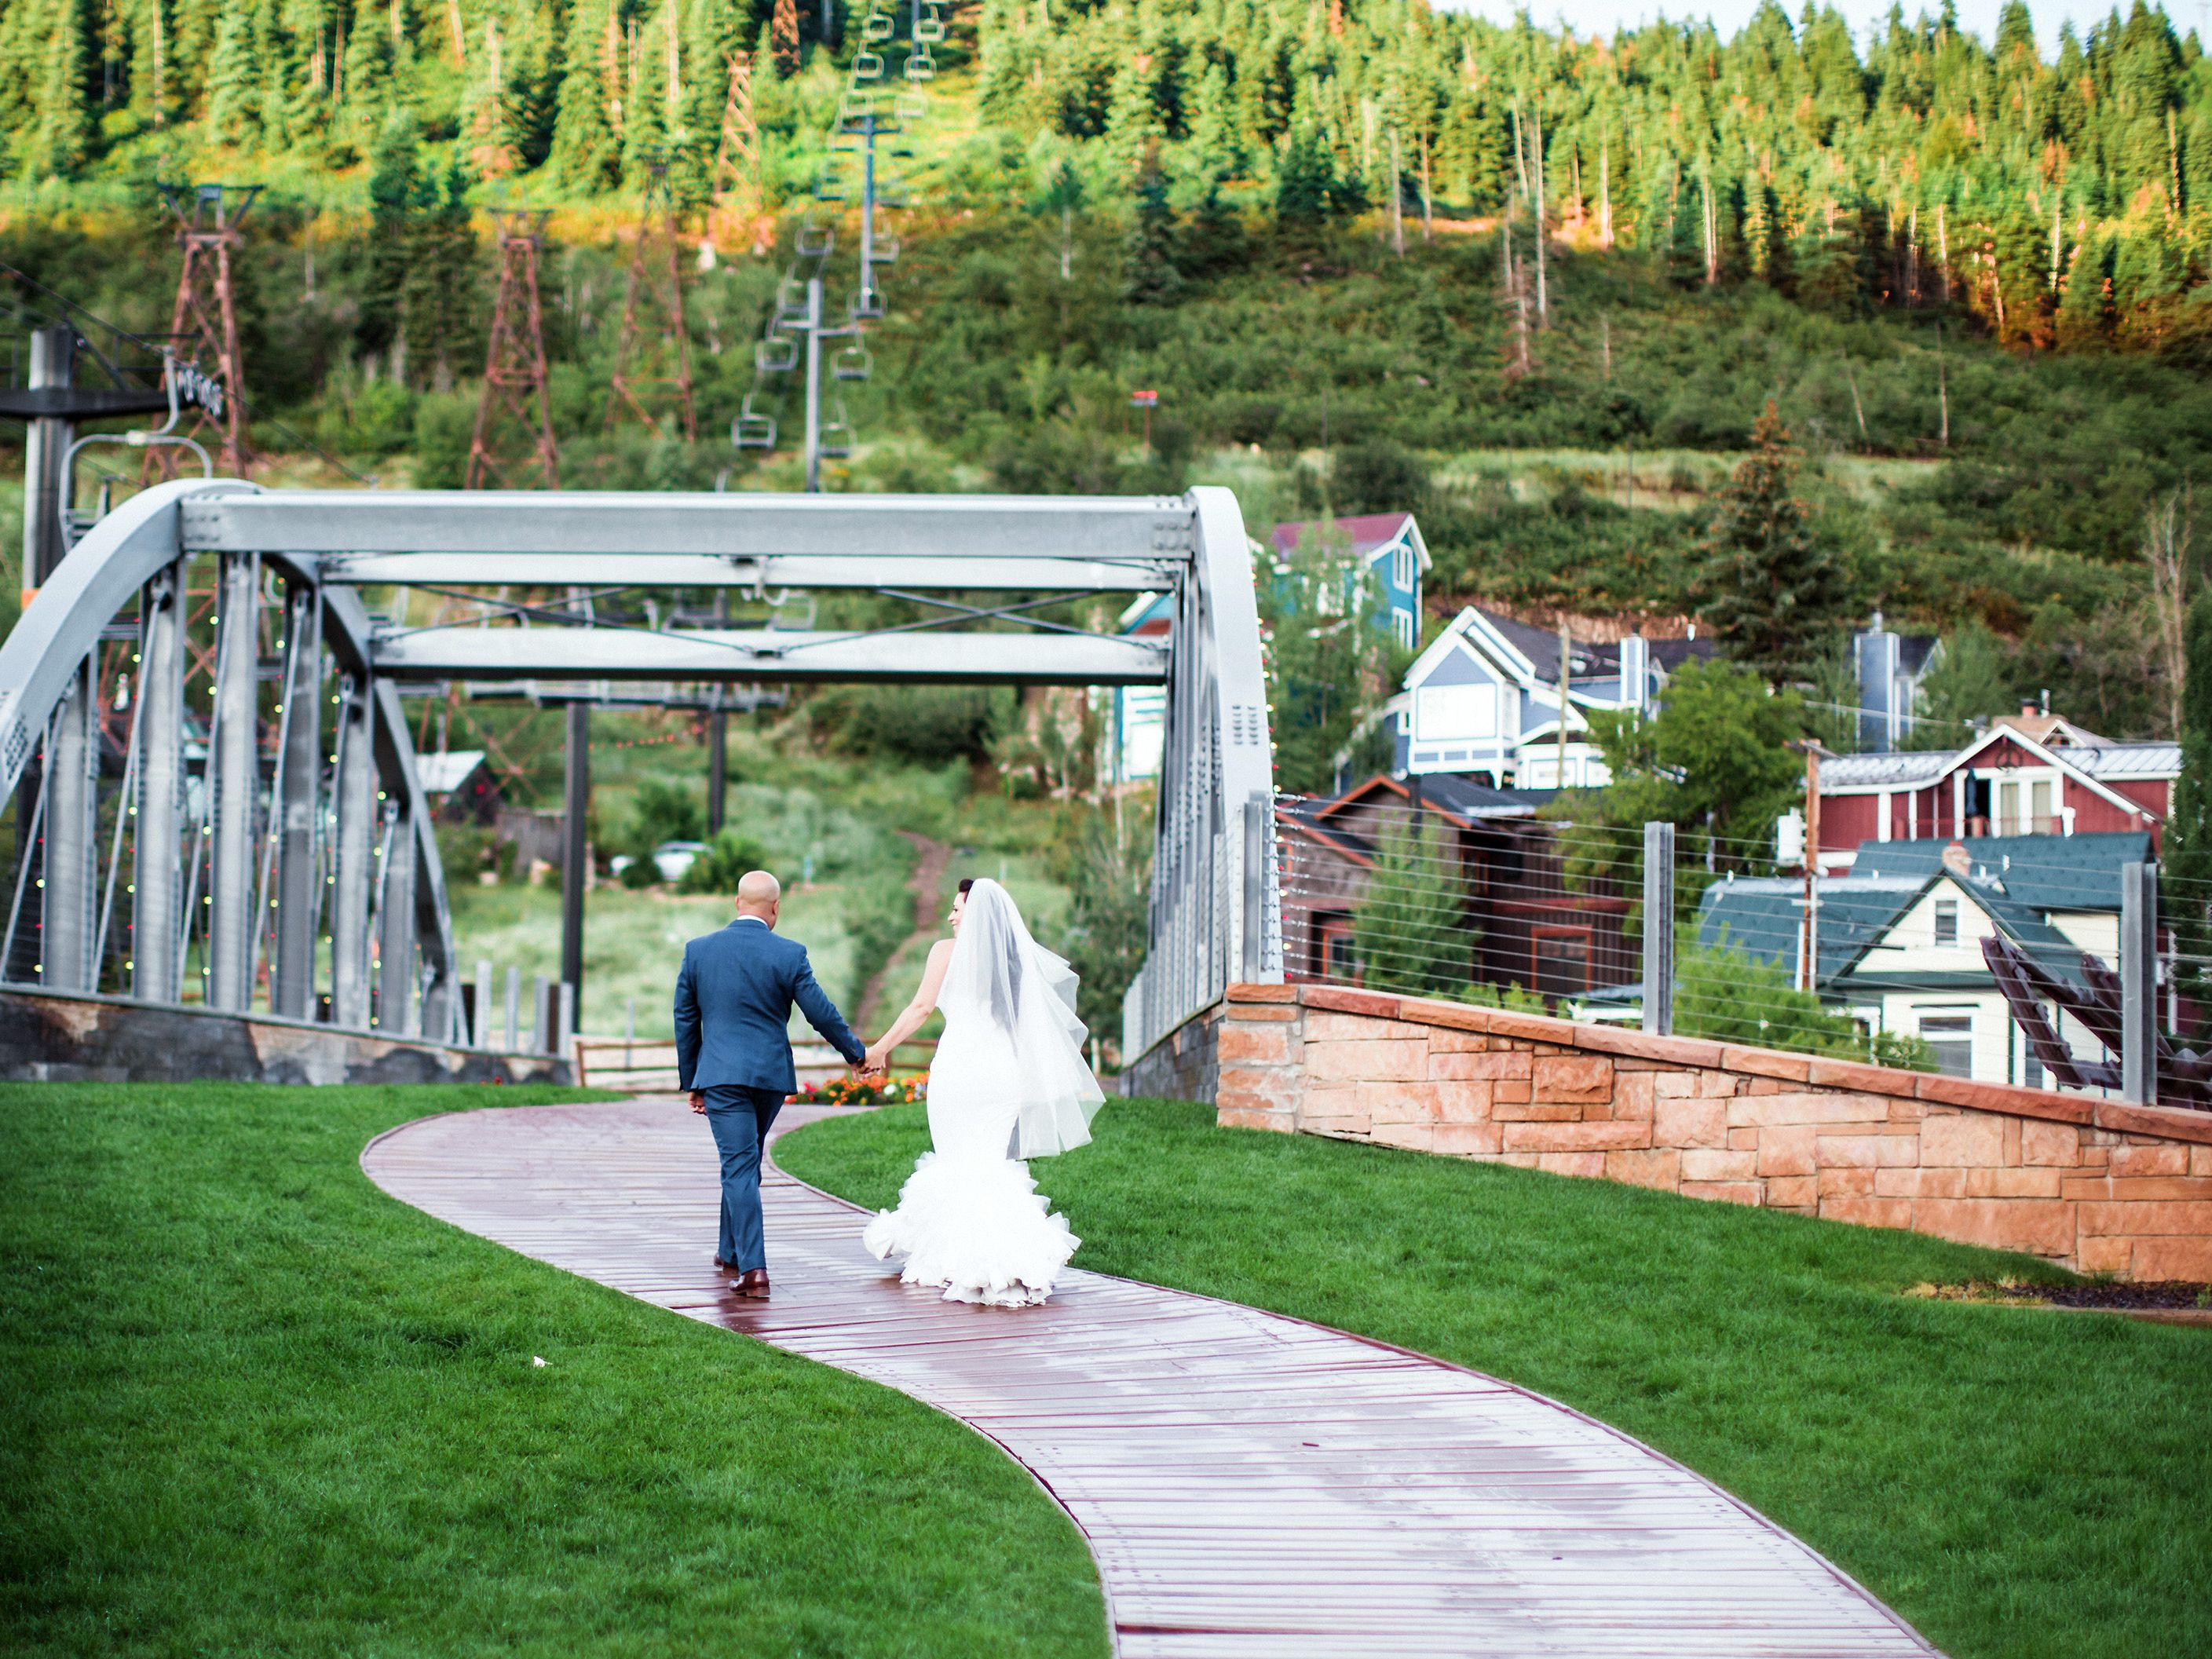 The Top 50 Destination Wedding Spots Wedding schedule